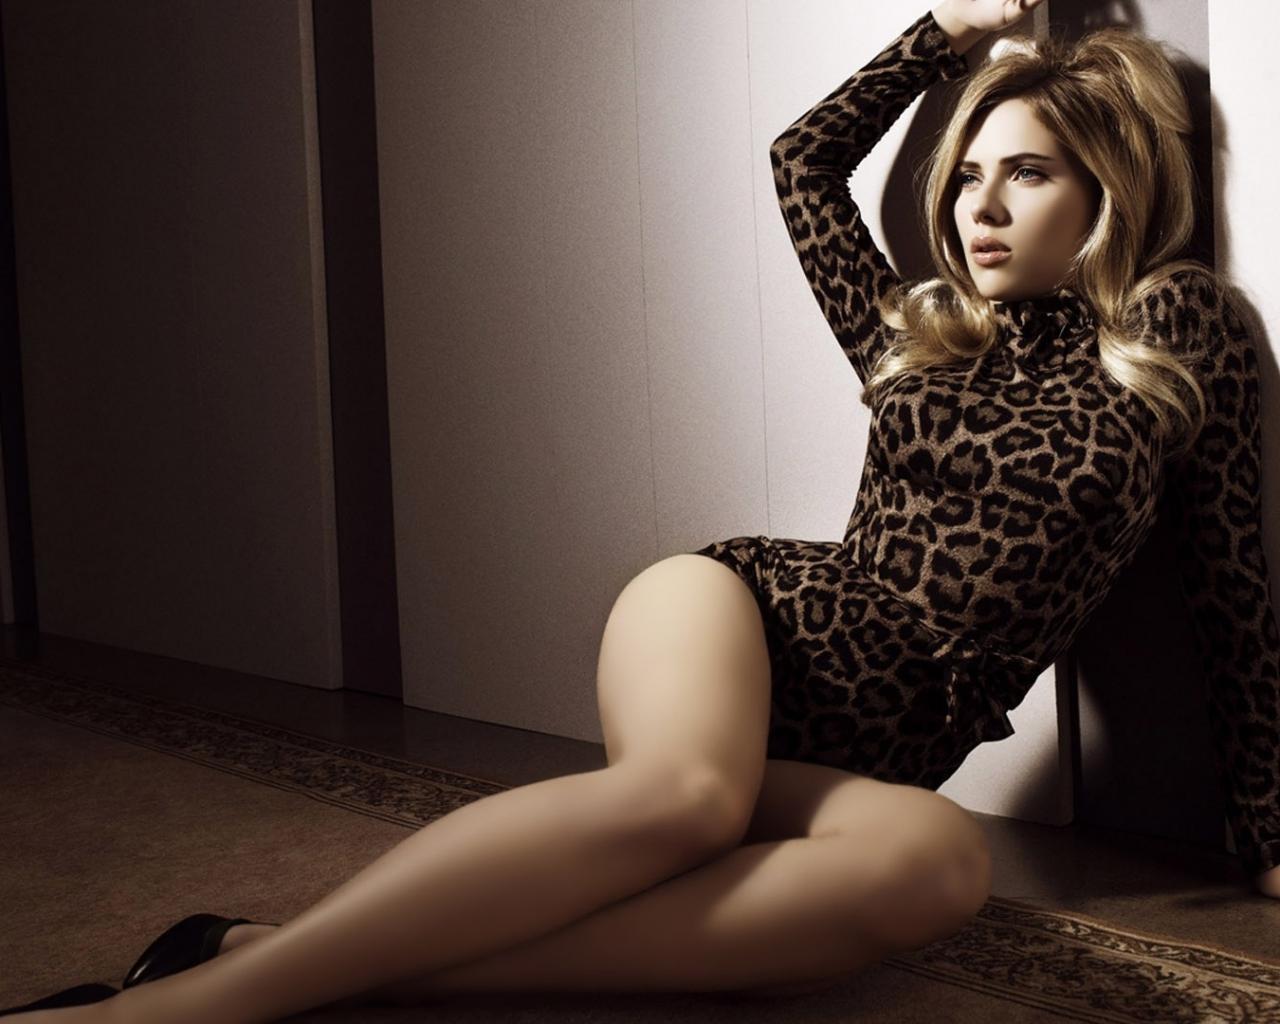 Фото знаменитостей еротичні 26 фотография